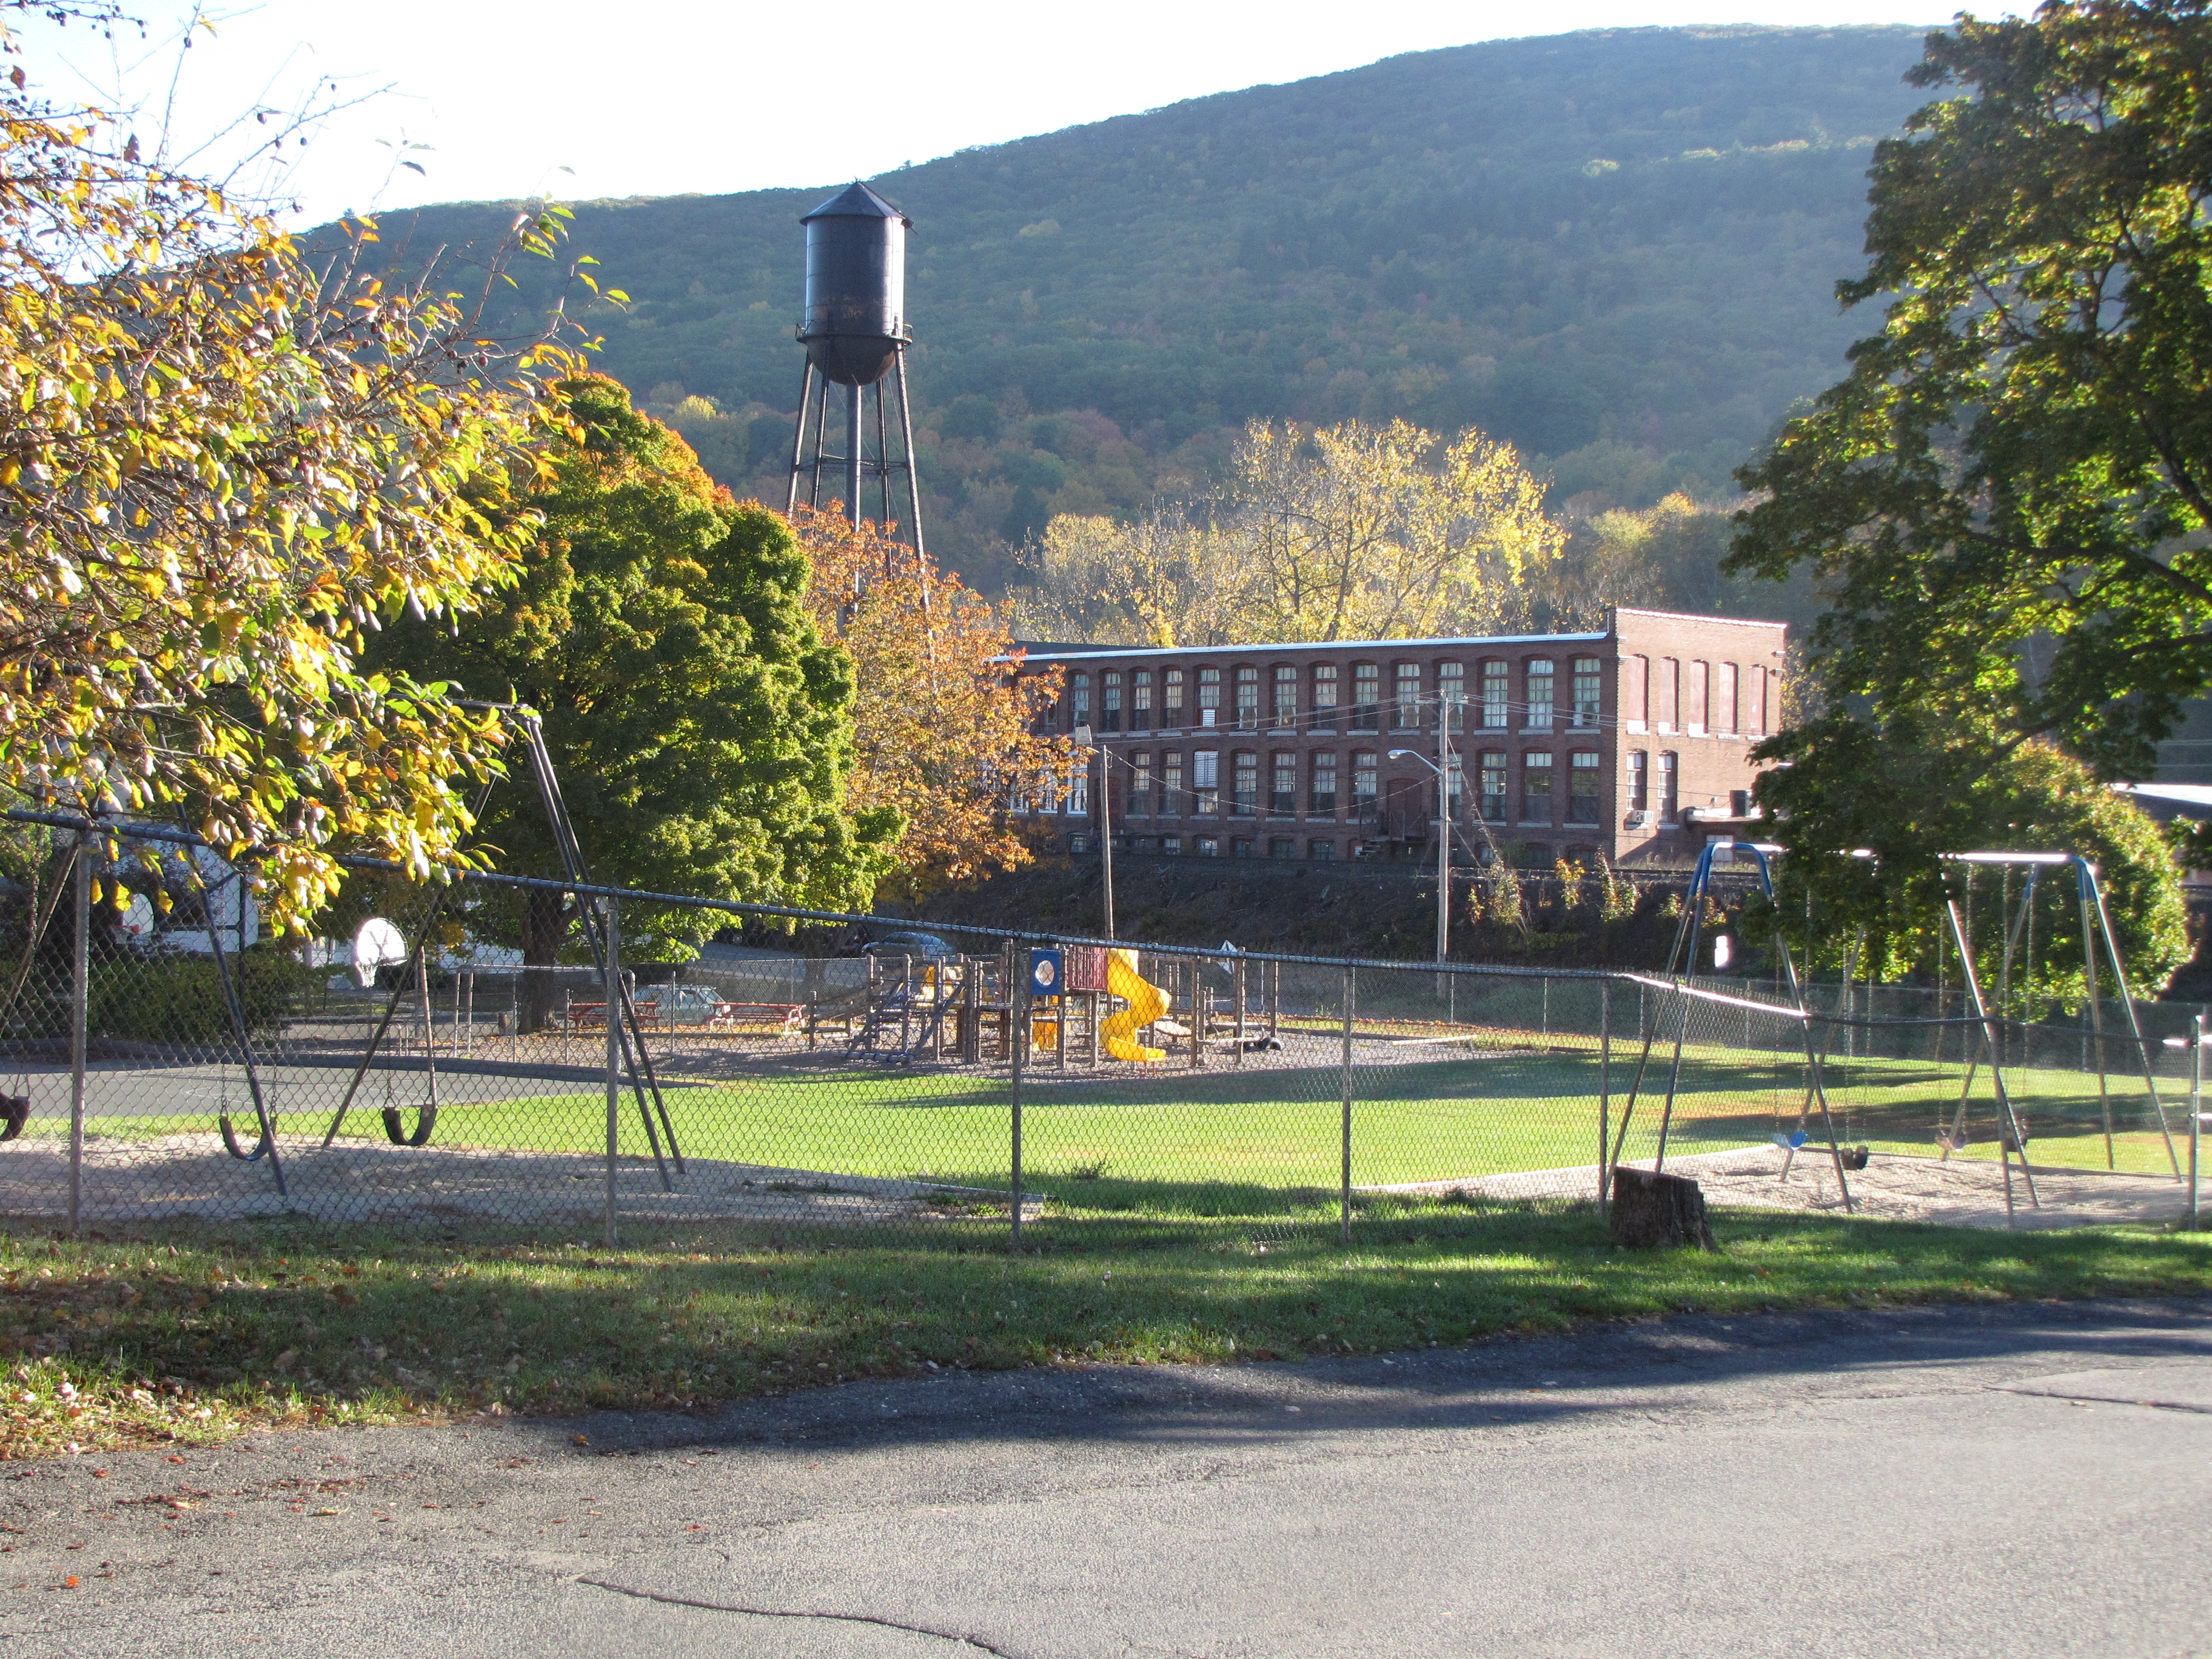 The playground area of the Housatonic School.